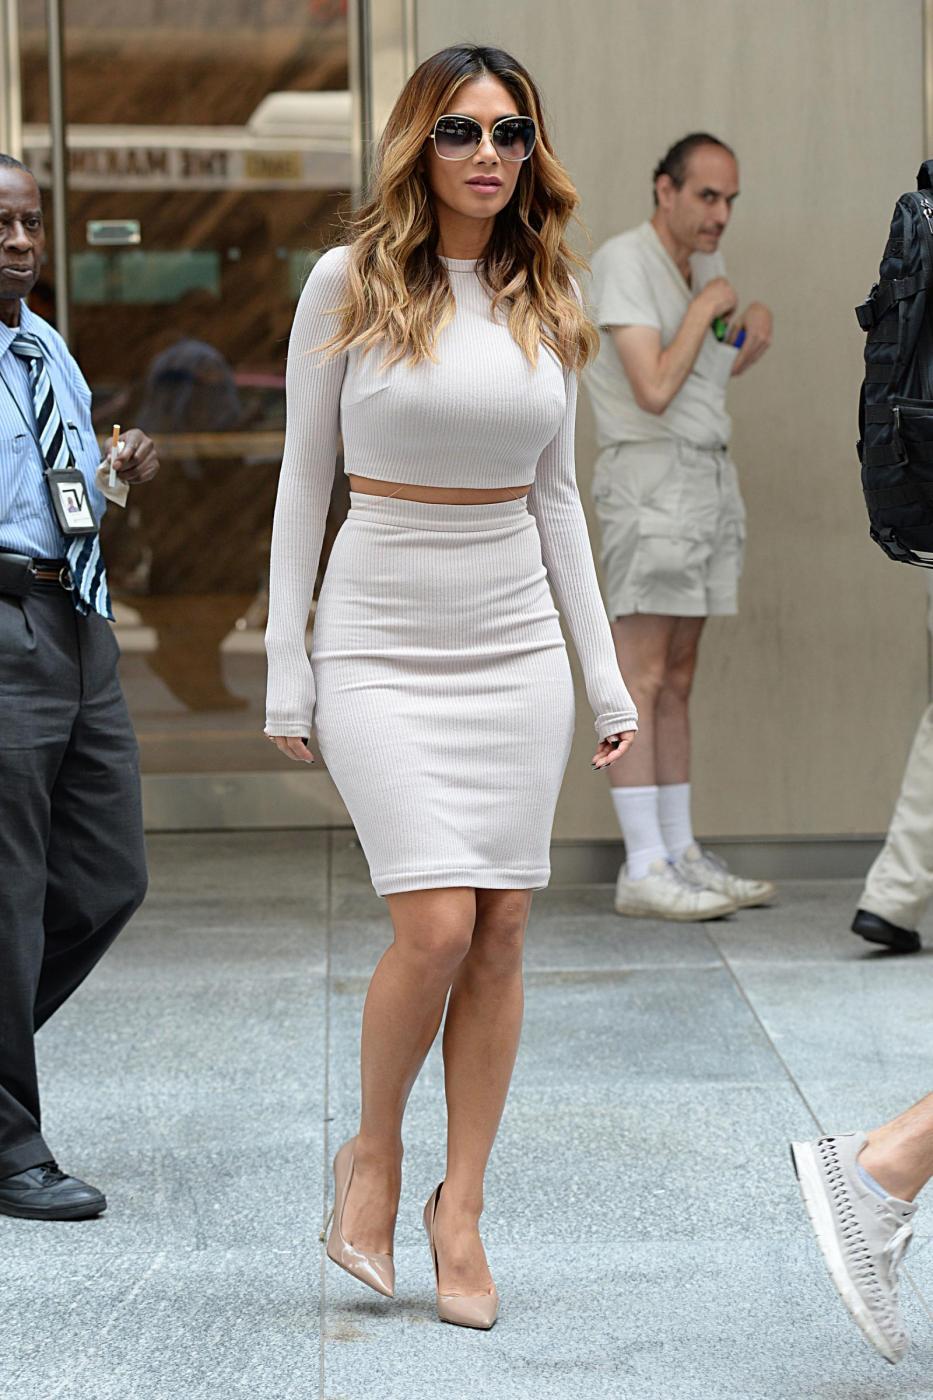 Nicole Scherzinger sempre più curvy e...bionda. Abiti super aderenti a New York FOTO 56